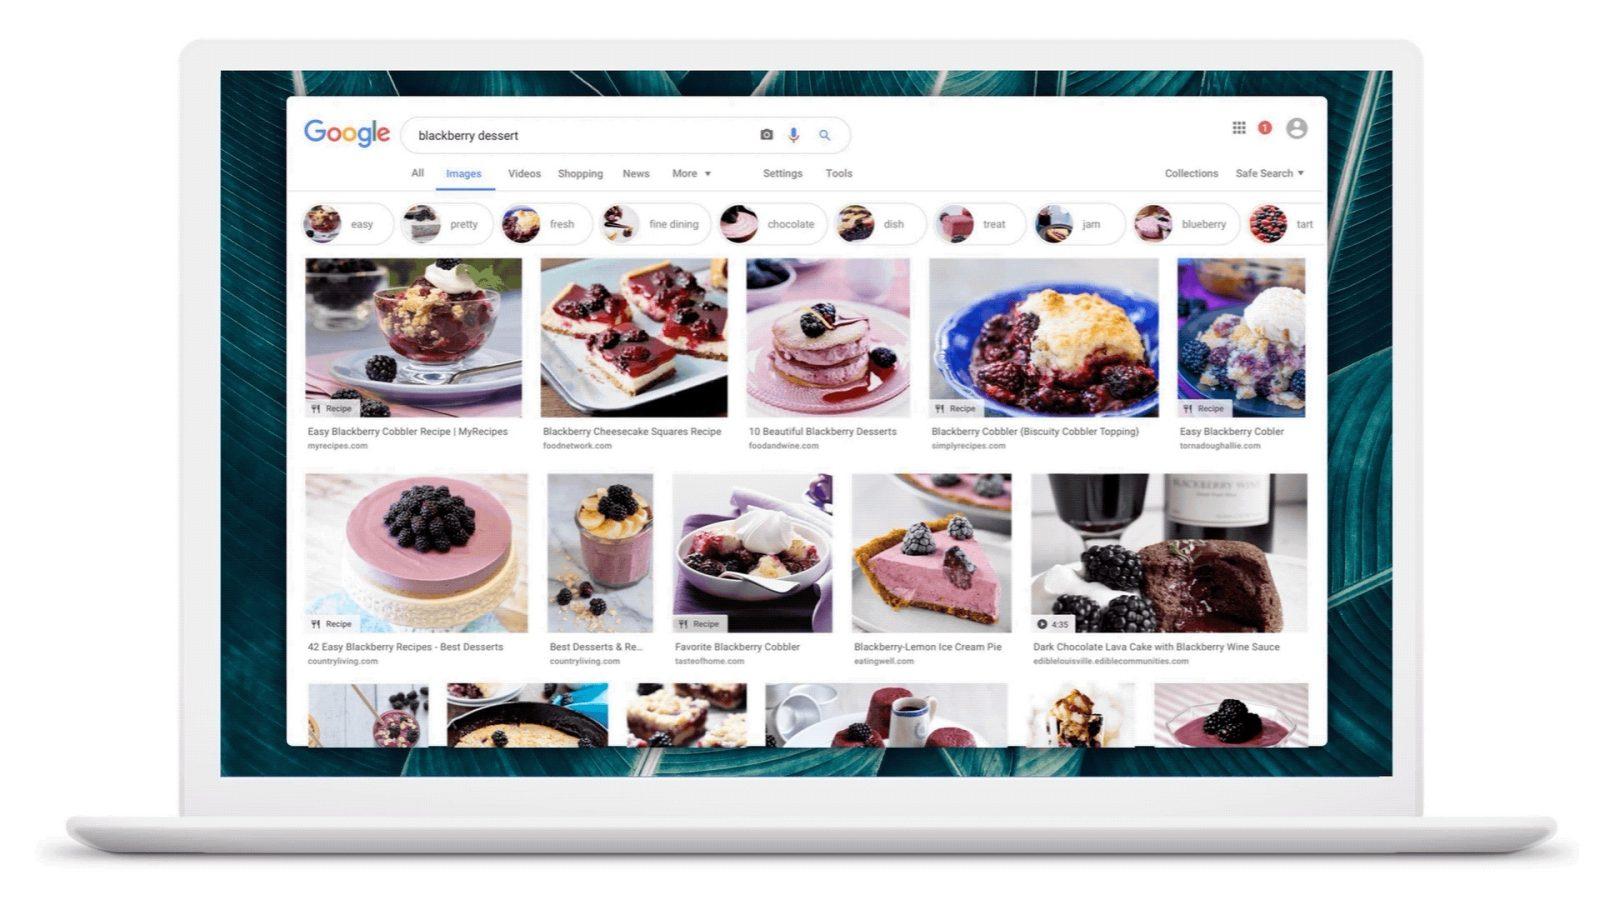 Google Images Gets Desktop Redesign With Mobile Site Adding Google Lens 9to5google